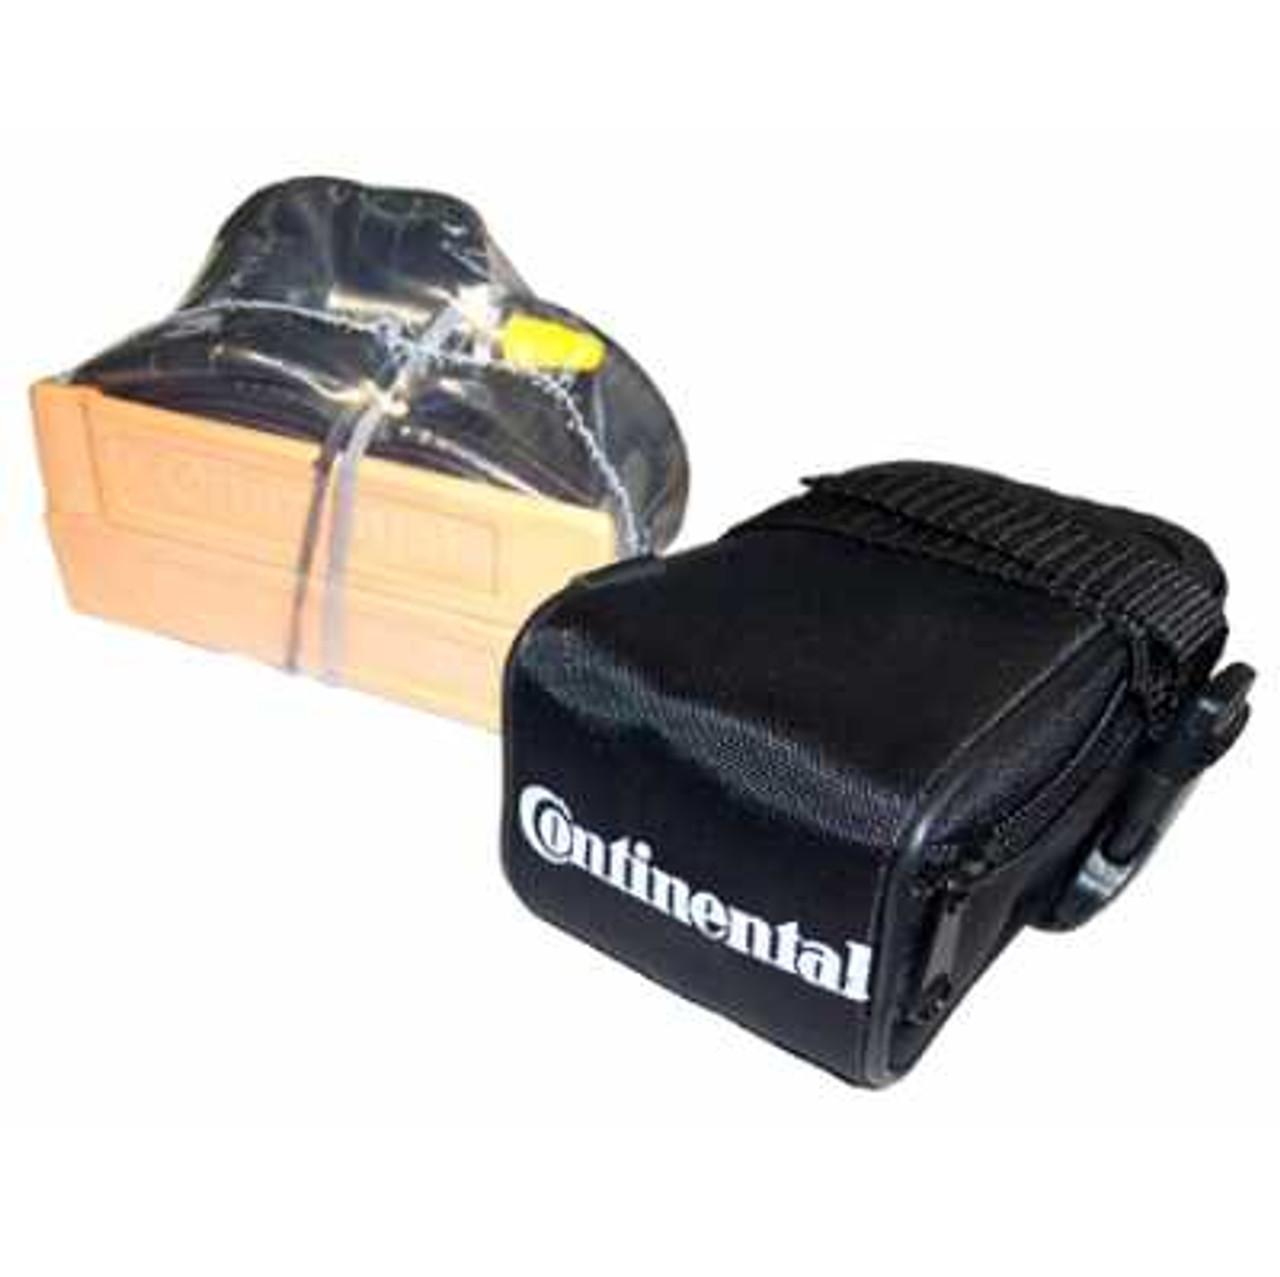 Continental Saddle Bag MTB including Tube & Levers